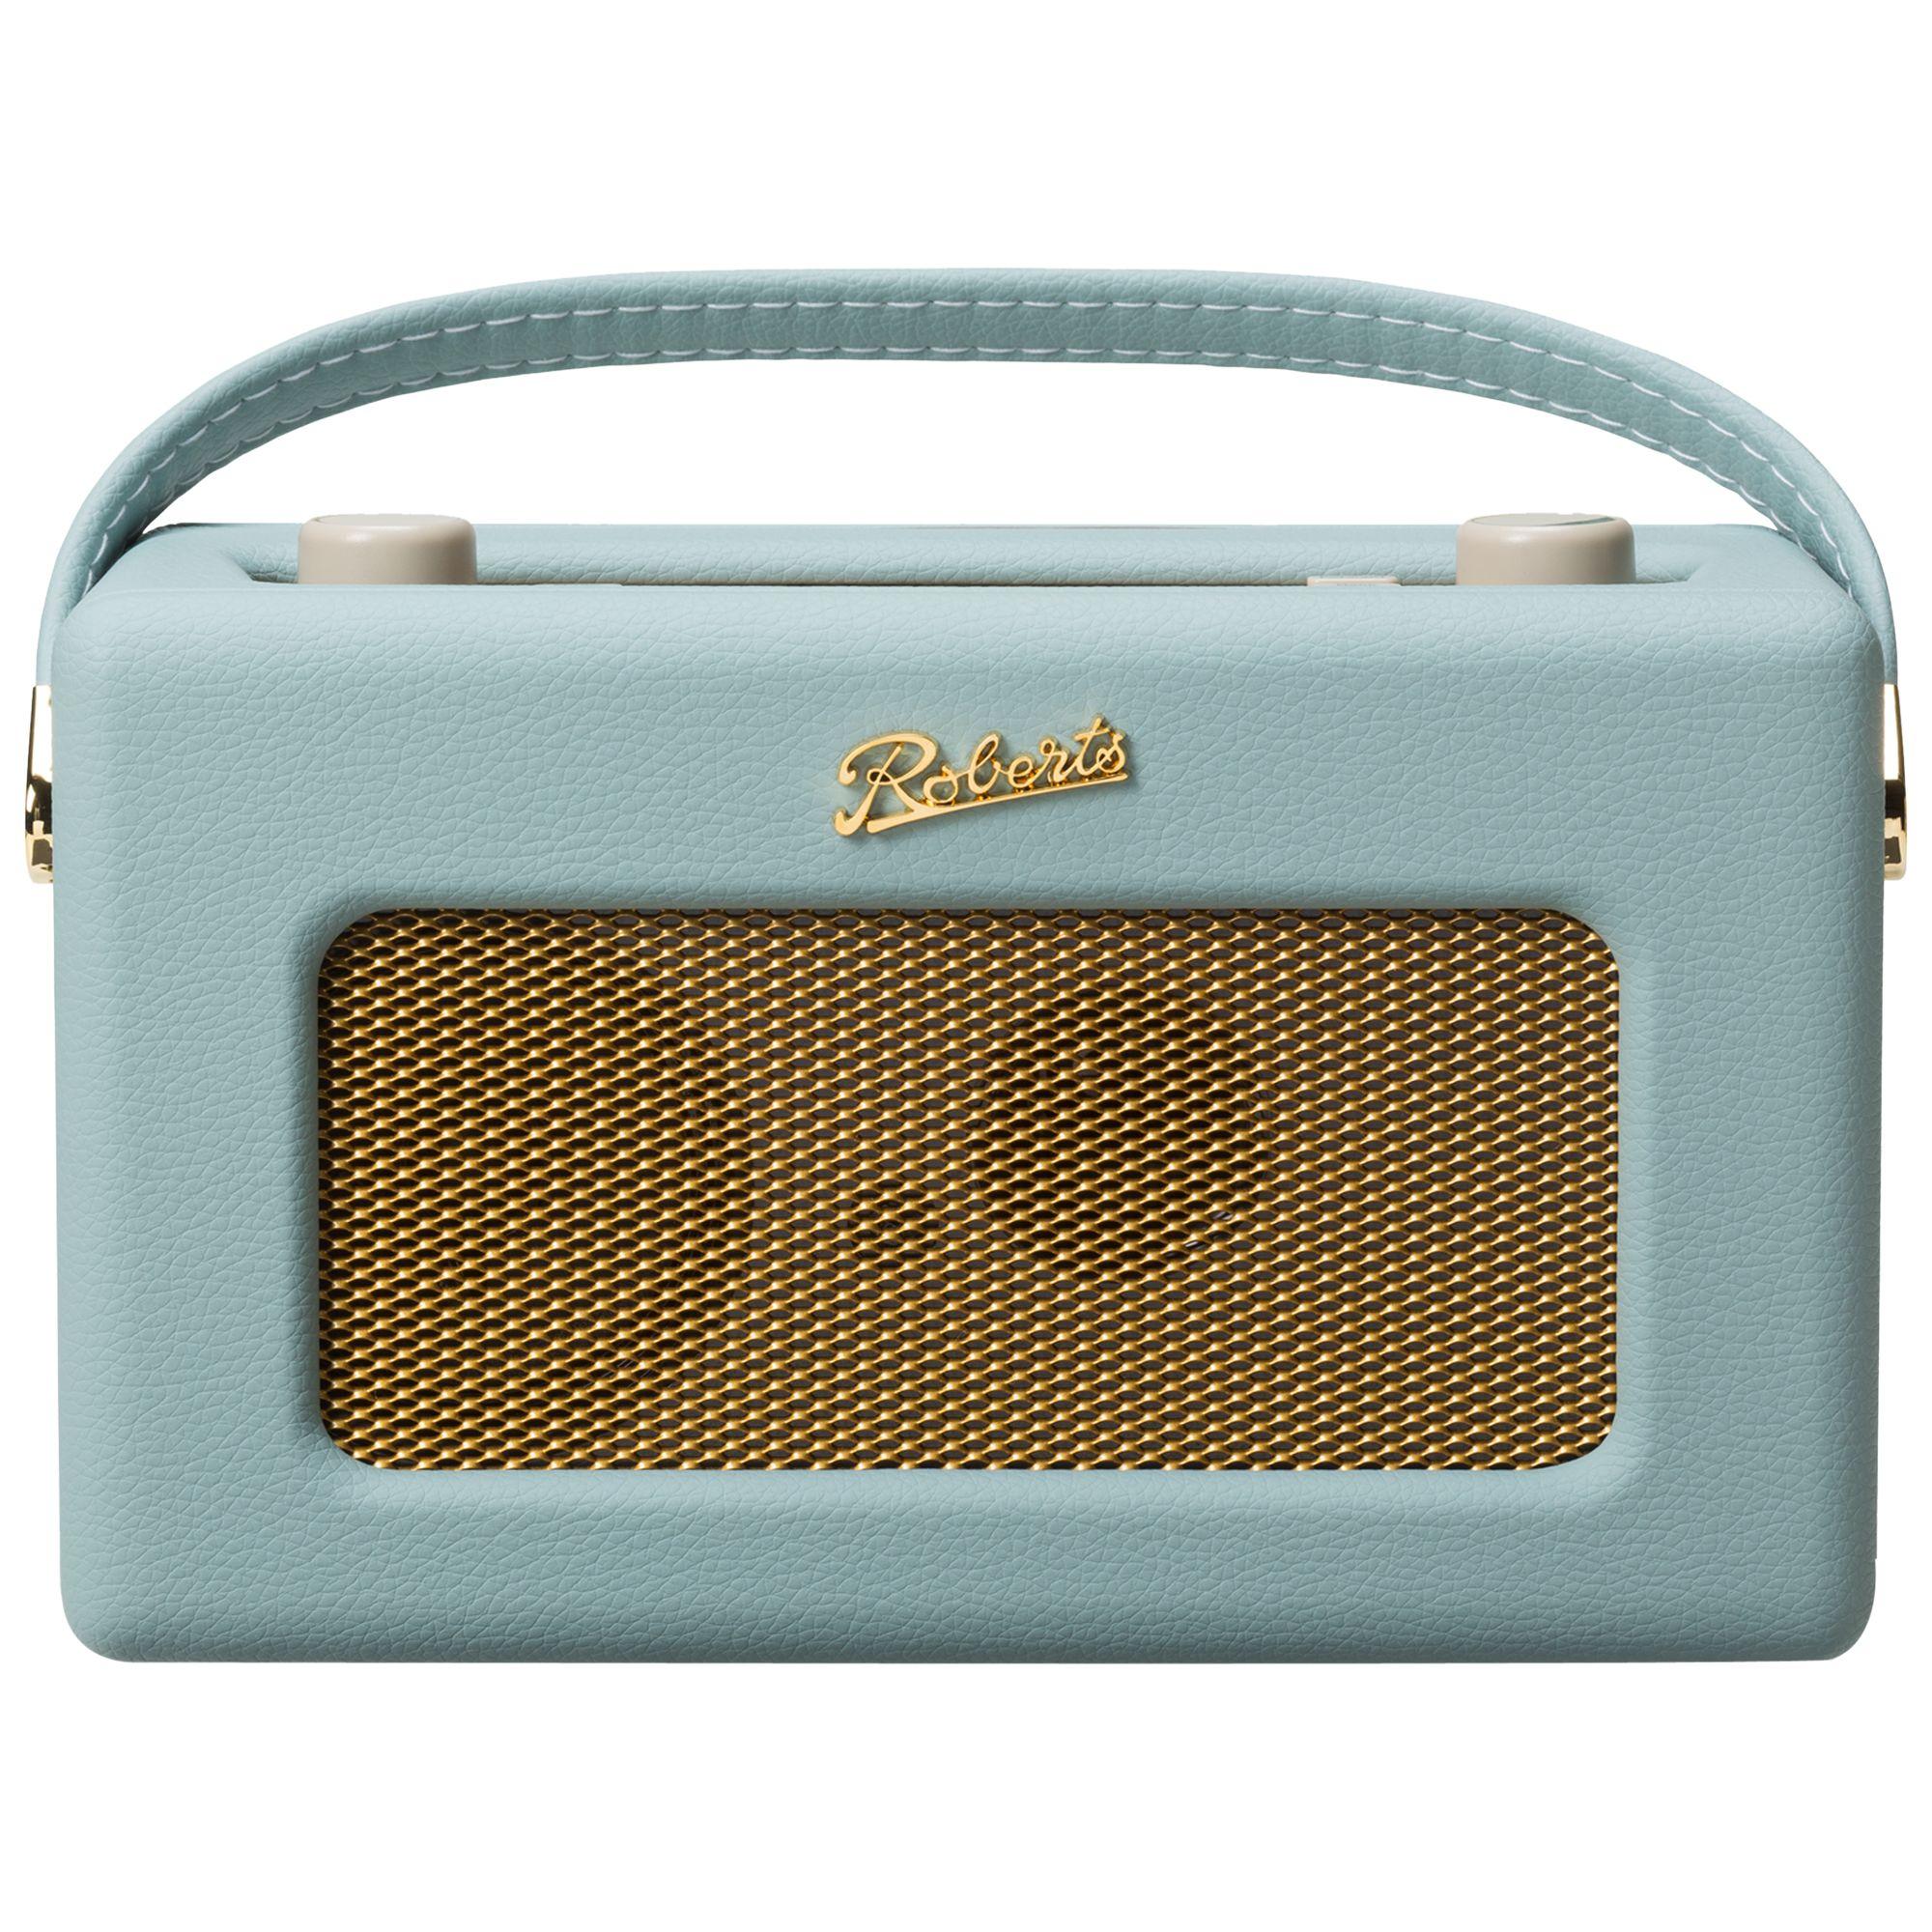 Roberts ROBERTS Revival iStream 2 Smart Radio With DAB+/FM Internet Radio